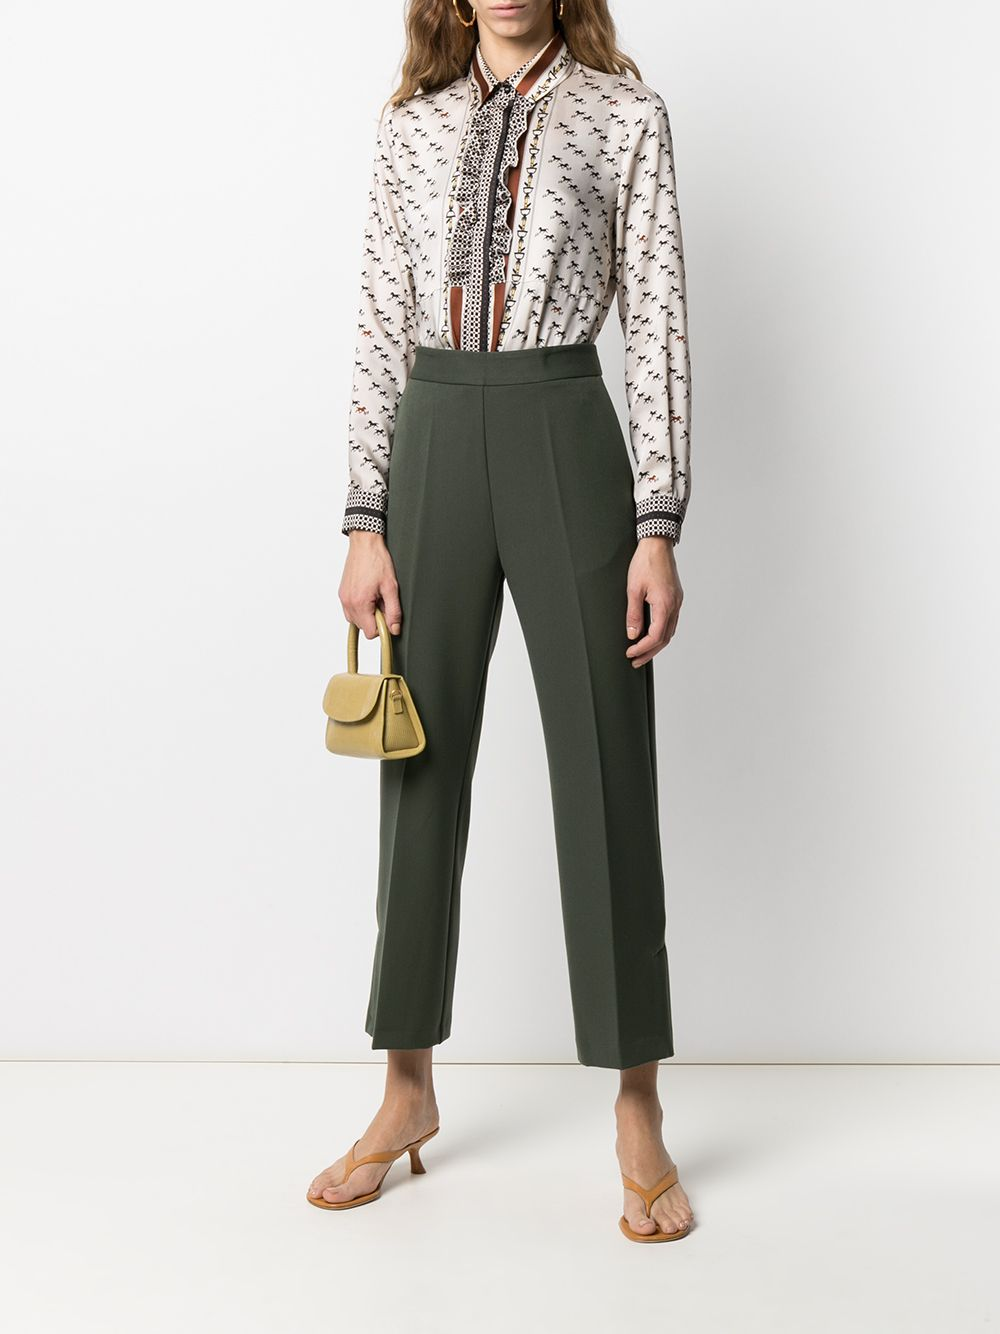 Green virgin wool cropped tailored trousers featuring high waist ALTEA |  | 206350145